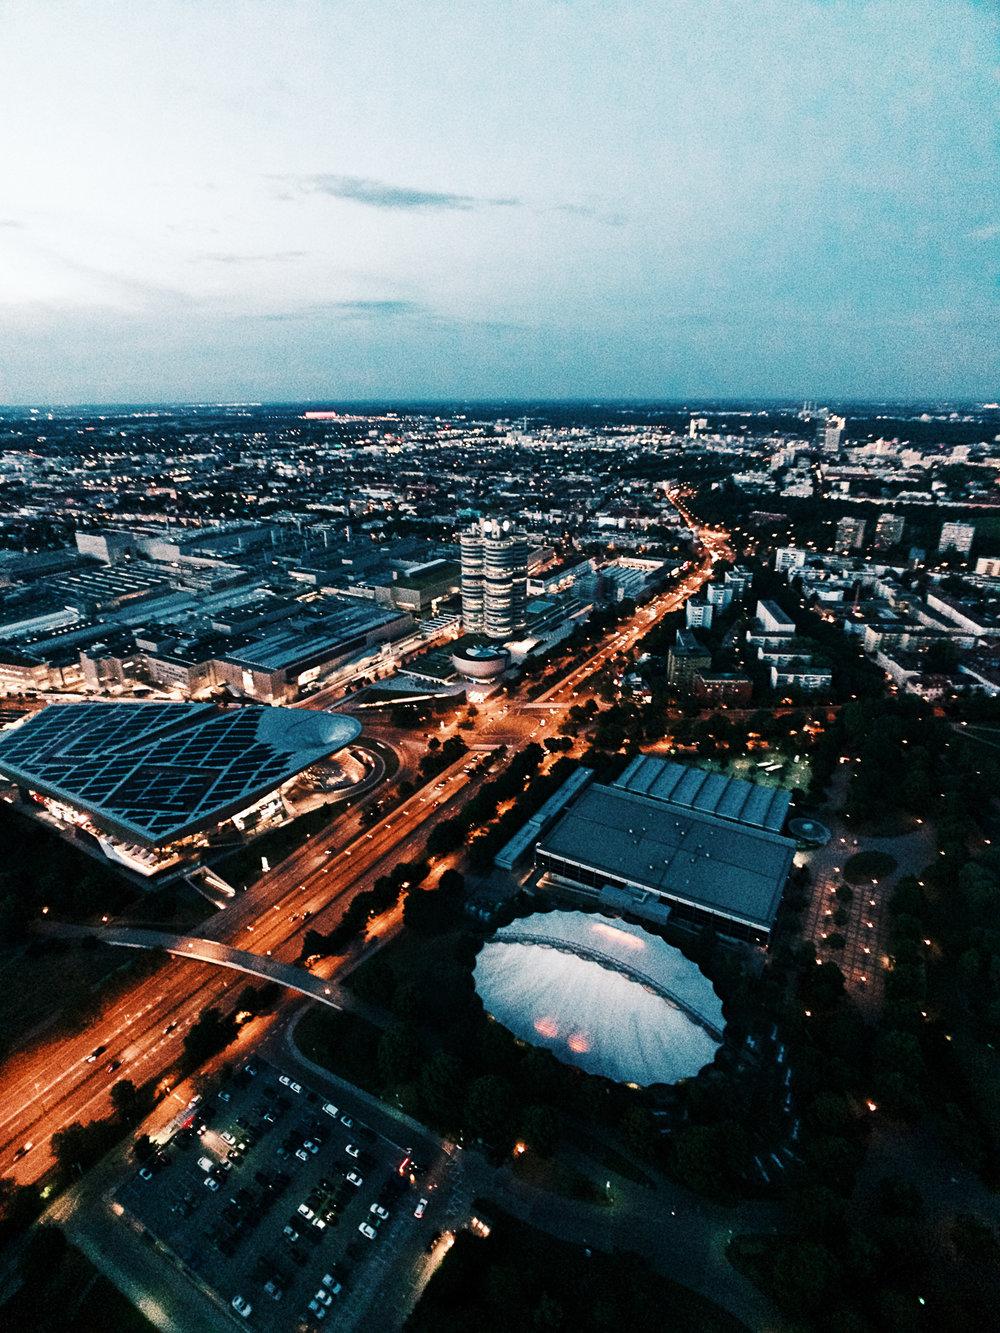 bitplay Olympiapark Tower   Y!PE 關於德國生活與旅遊的社群媒體-9.jpg